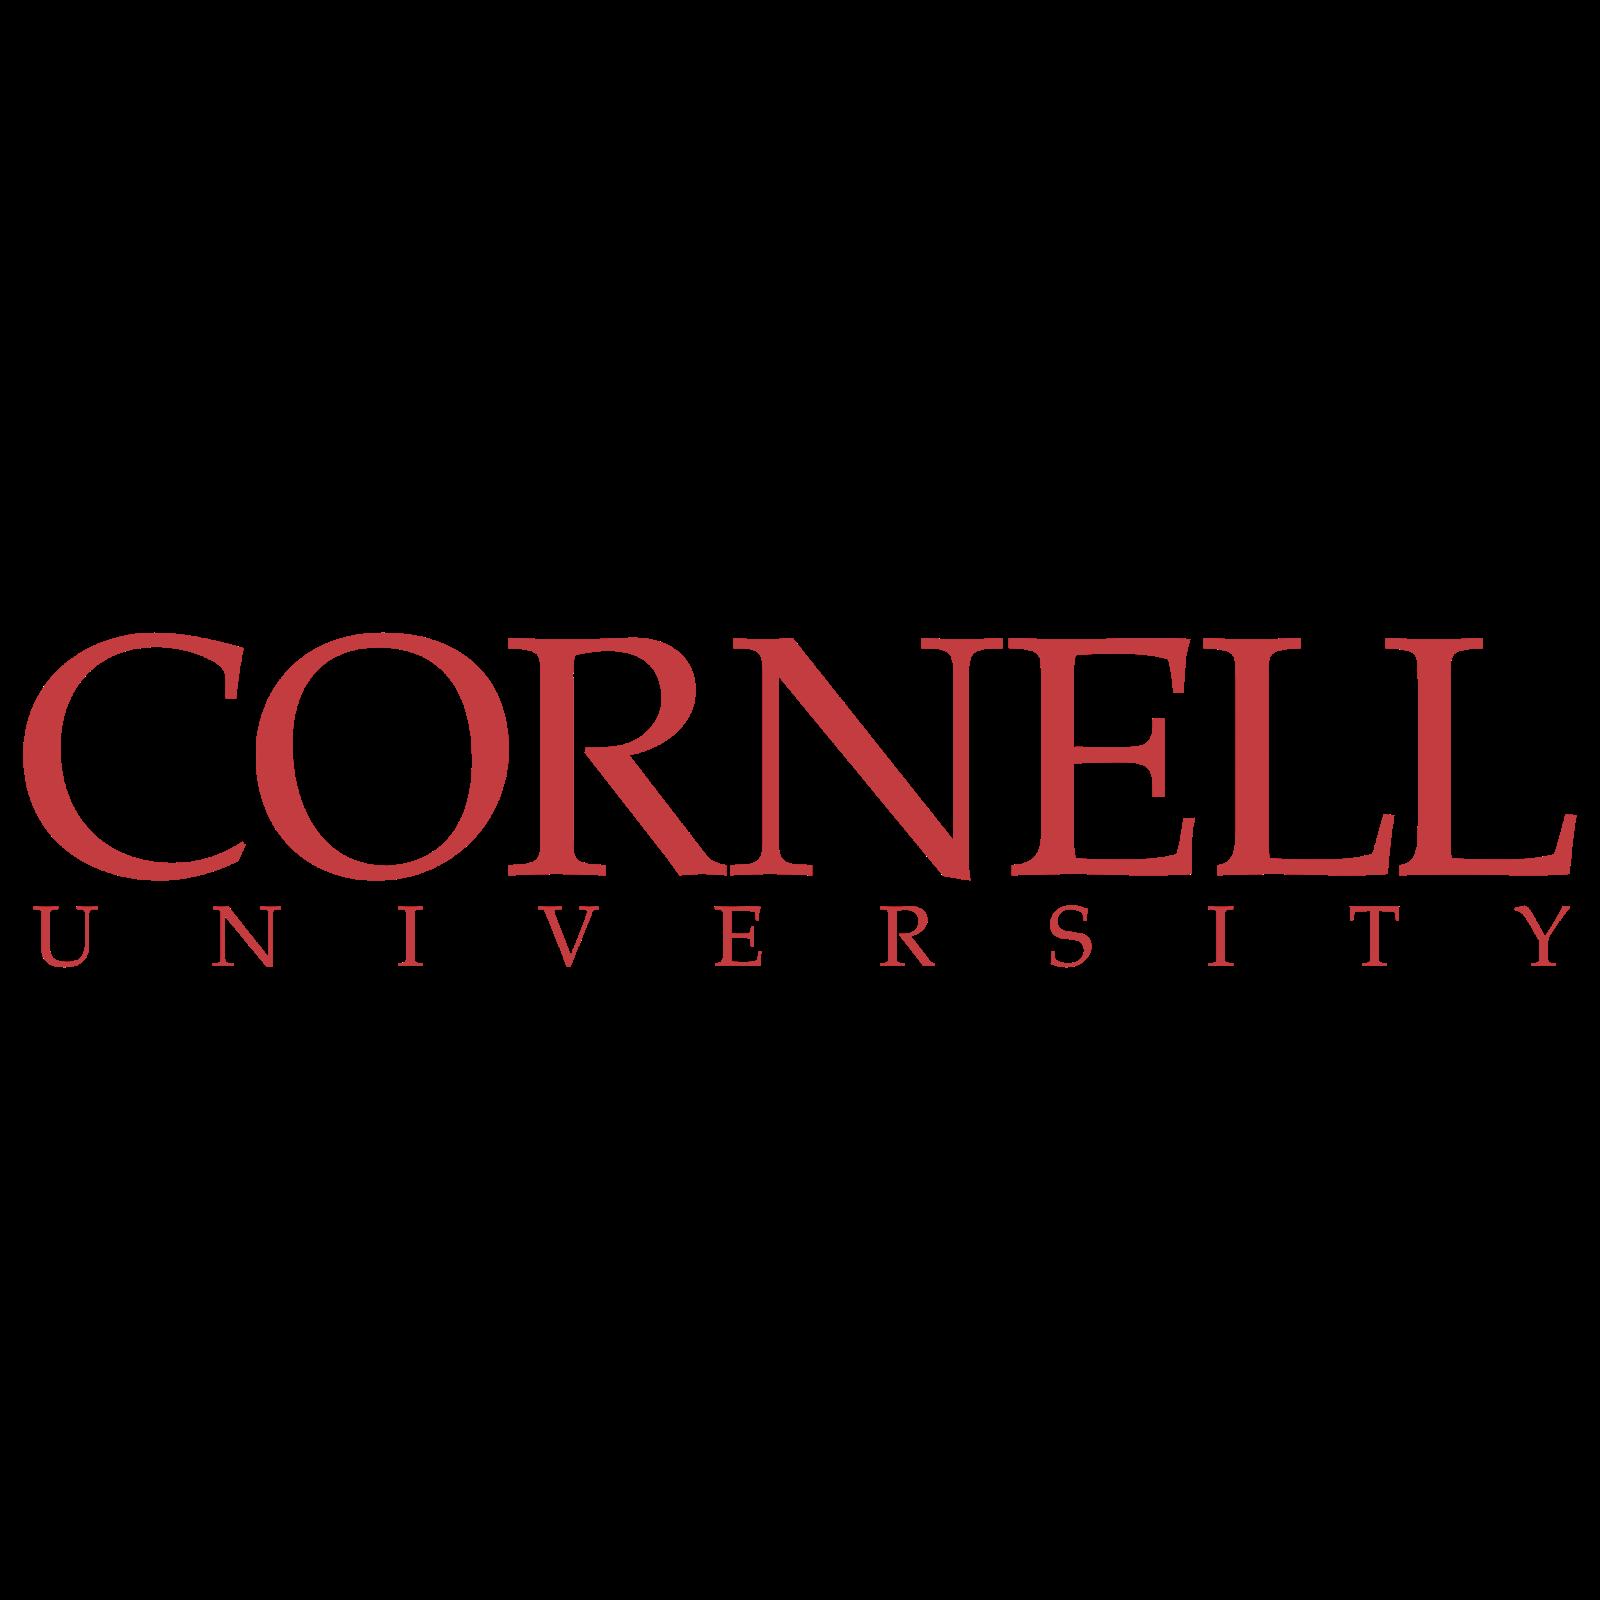 Cornel logo